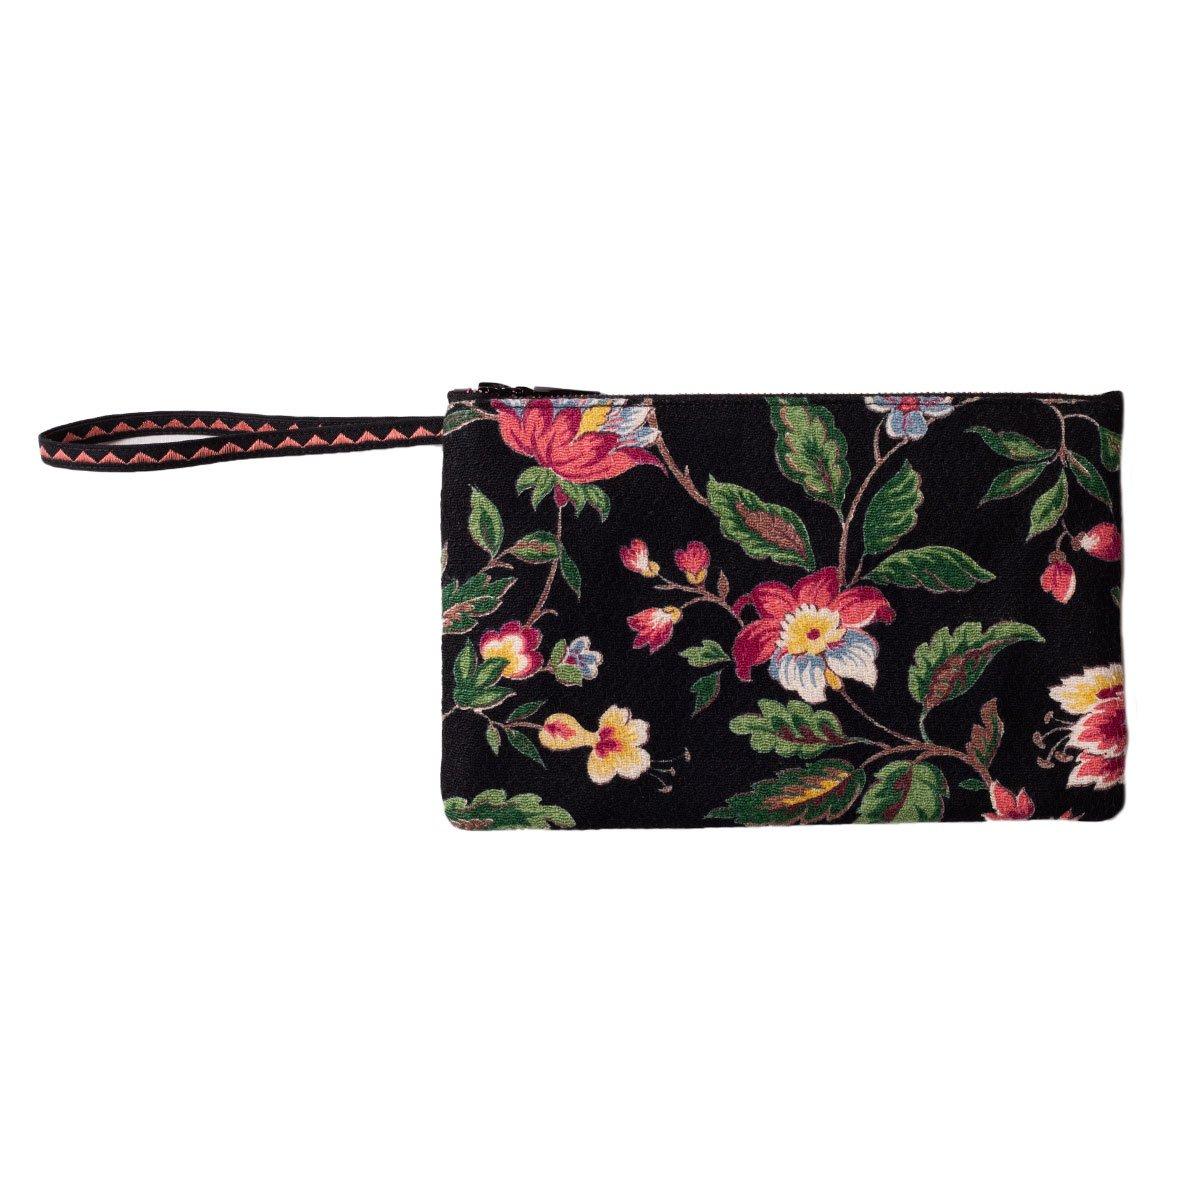 Hand Beaded Clutch Bag Sm Floral Motif on Black